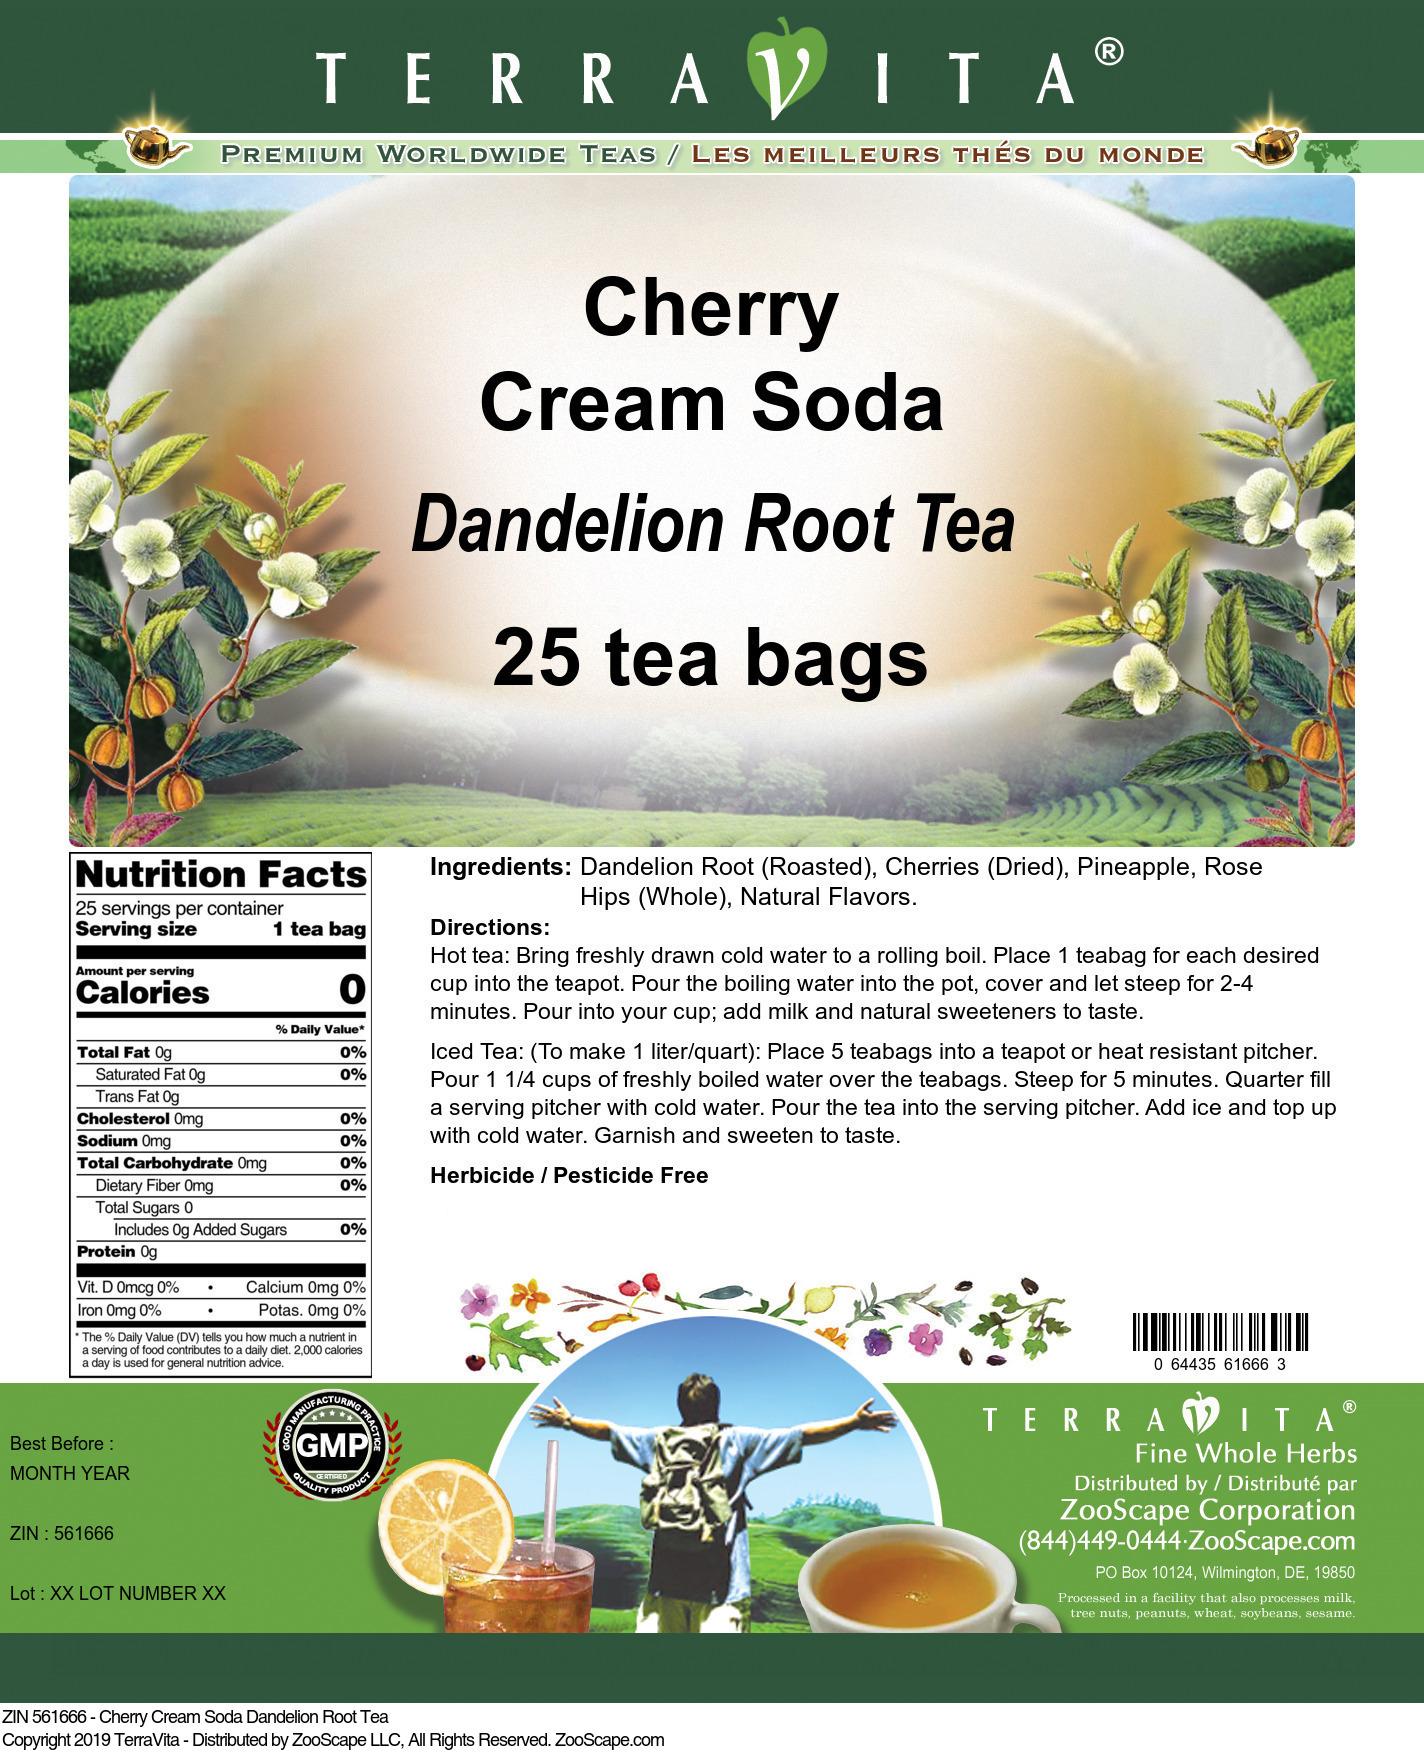 Cherry Cream Soda Dandelion Root Tea